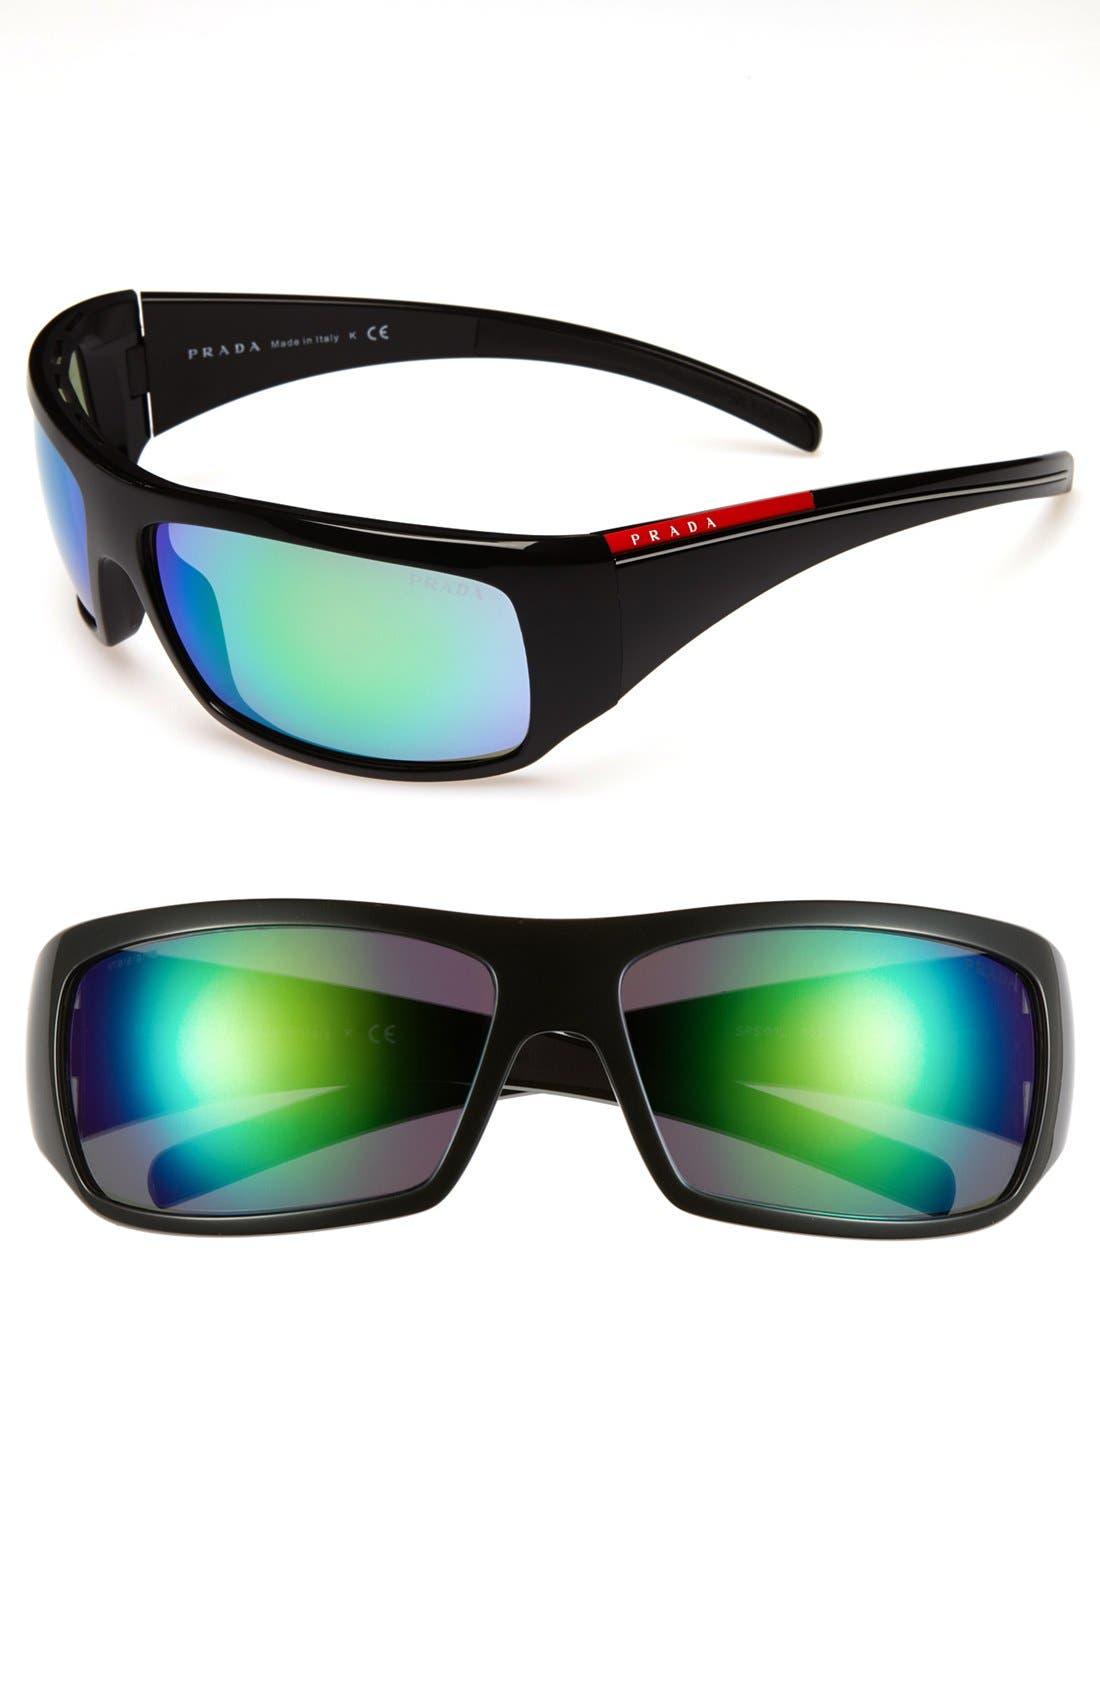 Main Image - Prada 'America's Cup Collection' 65mm Wraparound Sunglasses